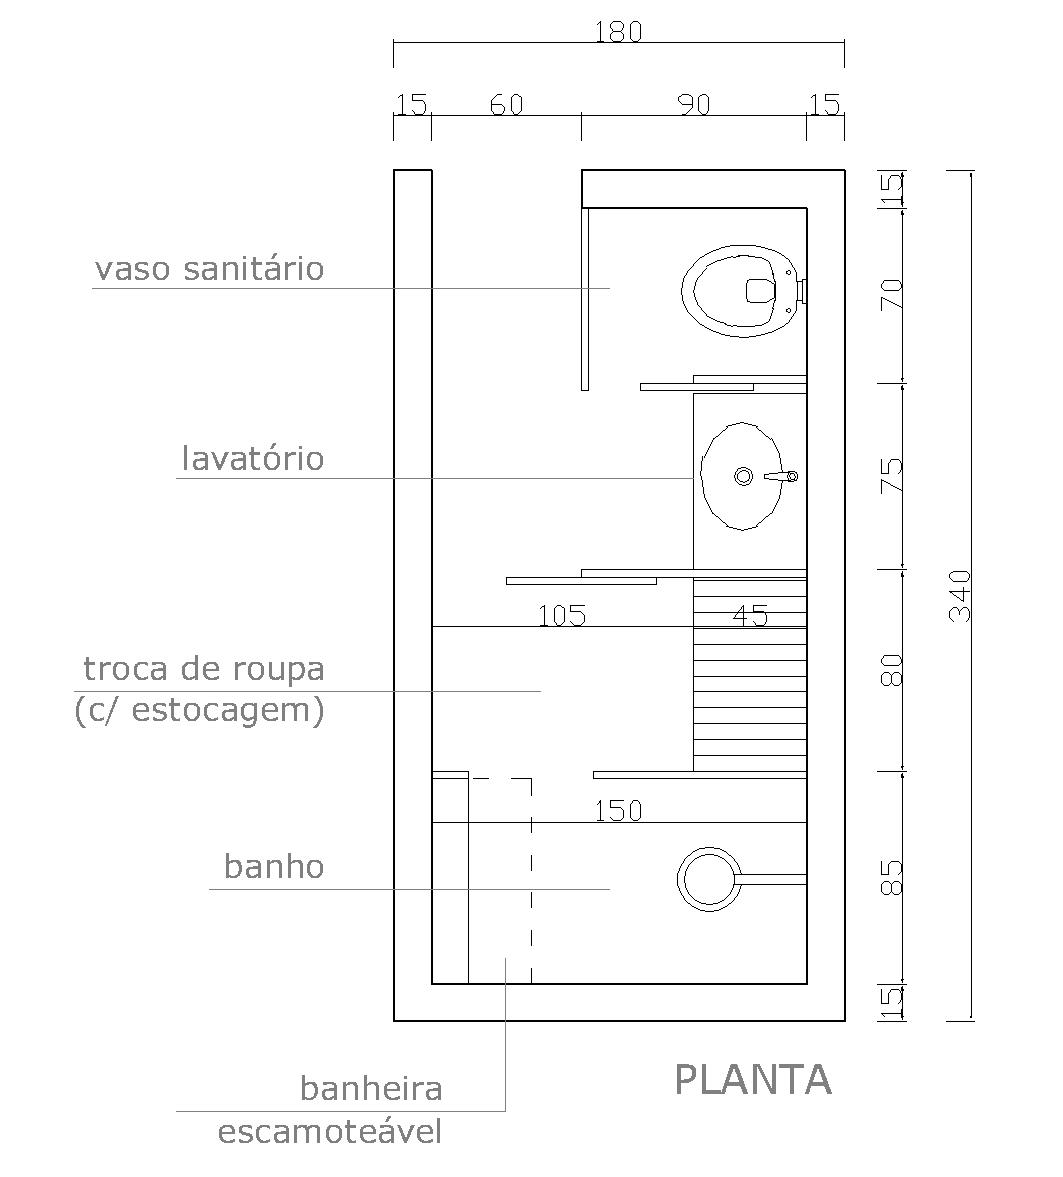 planta do banheiro proposto perspectiva ilustrativa do banheiro  #666666 1063 1177